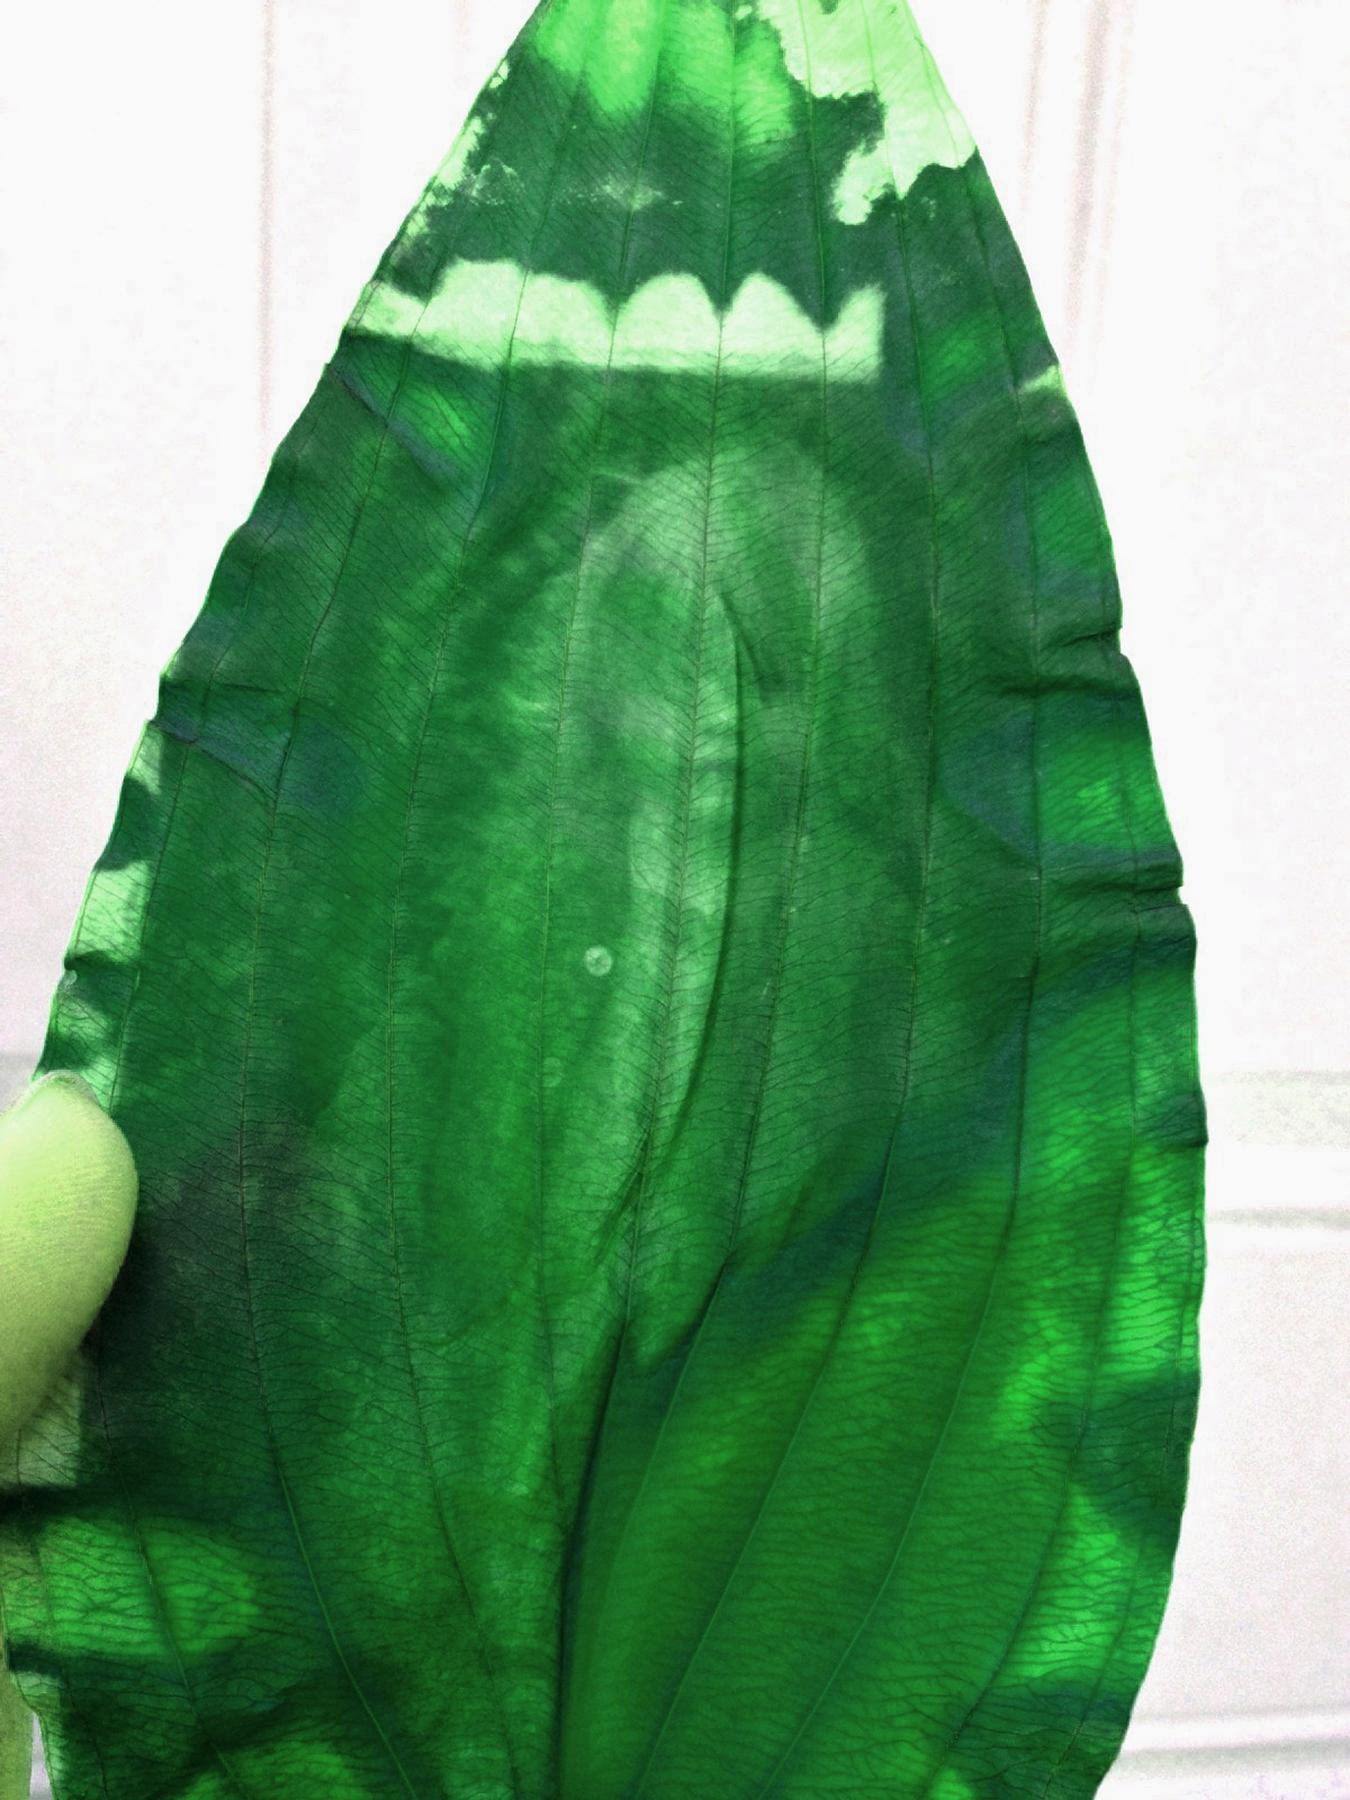 chlorophyll_ivy.jpg